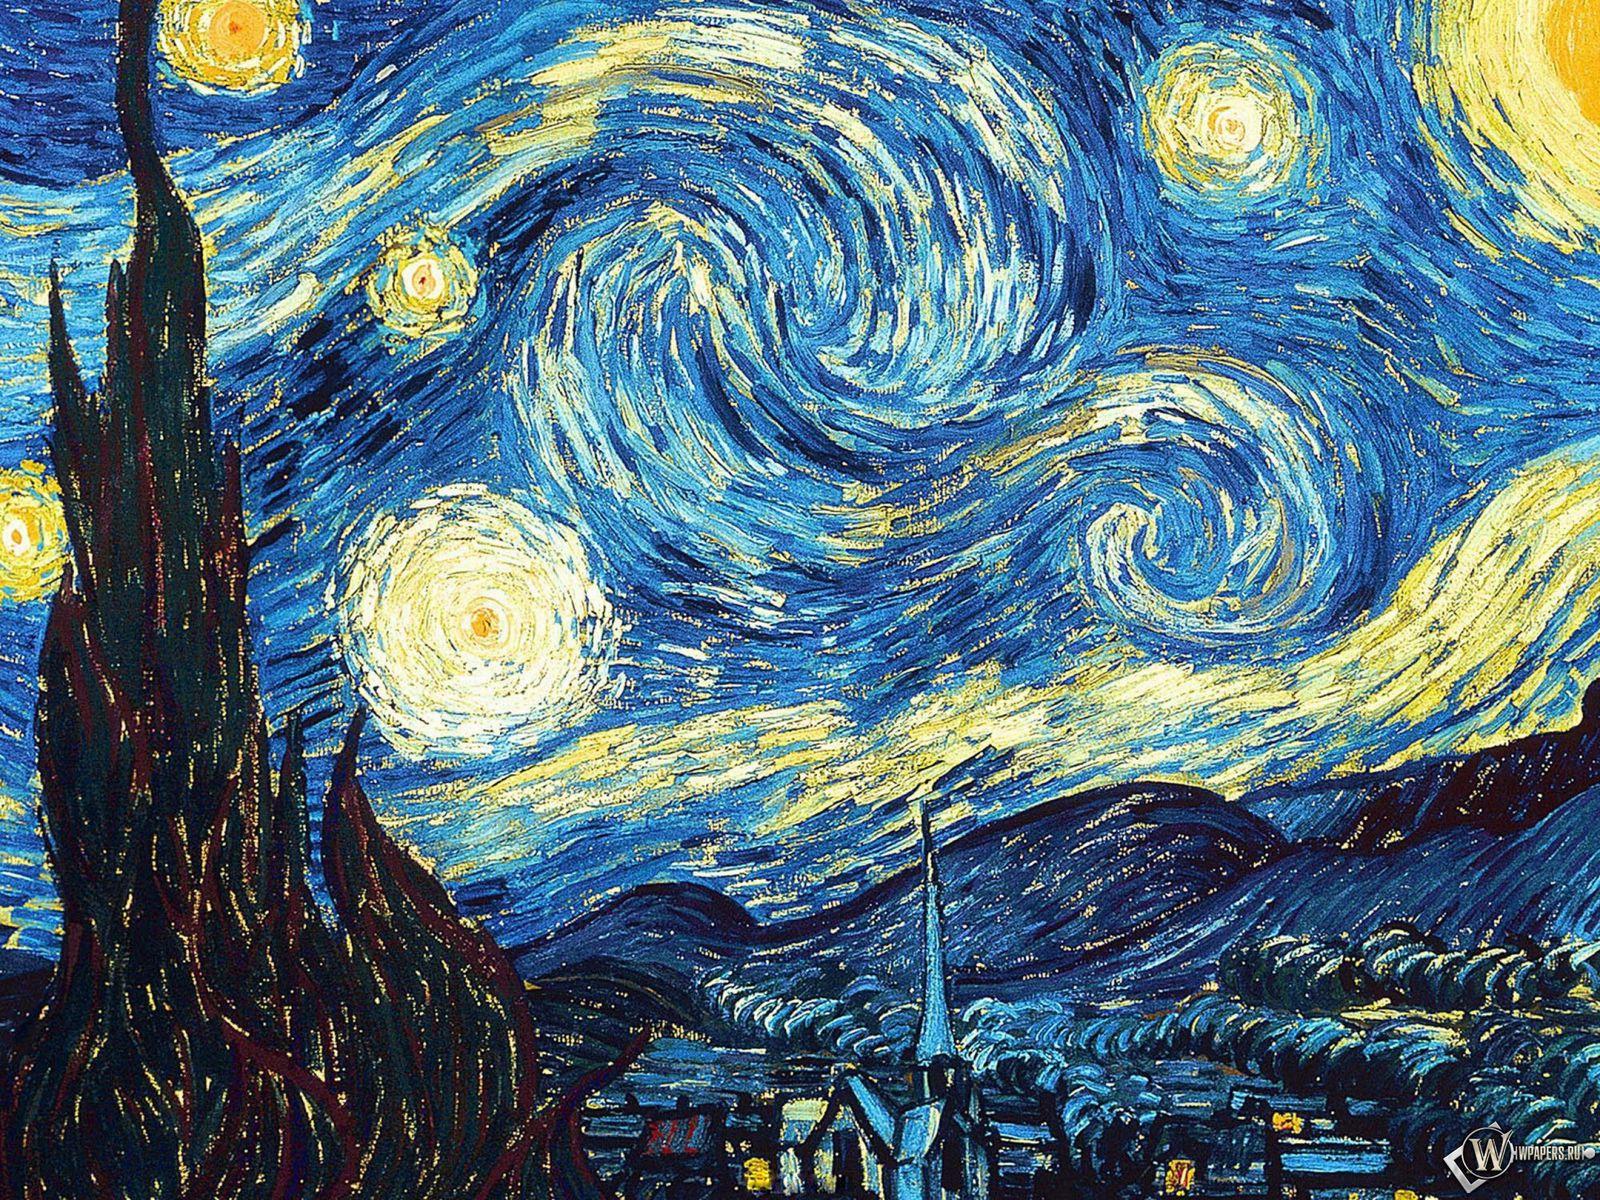 1600x1200 Wallpaper vincent van gogh, the starry night, oil, canvas